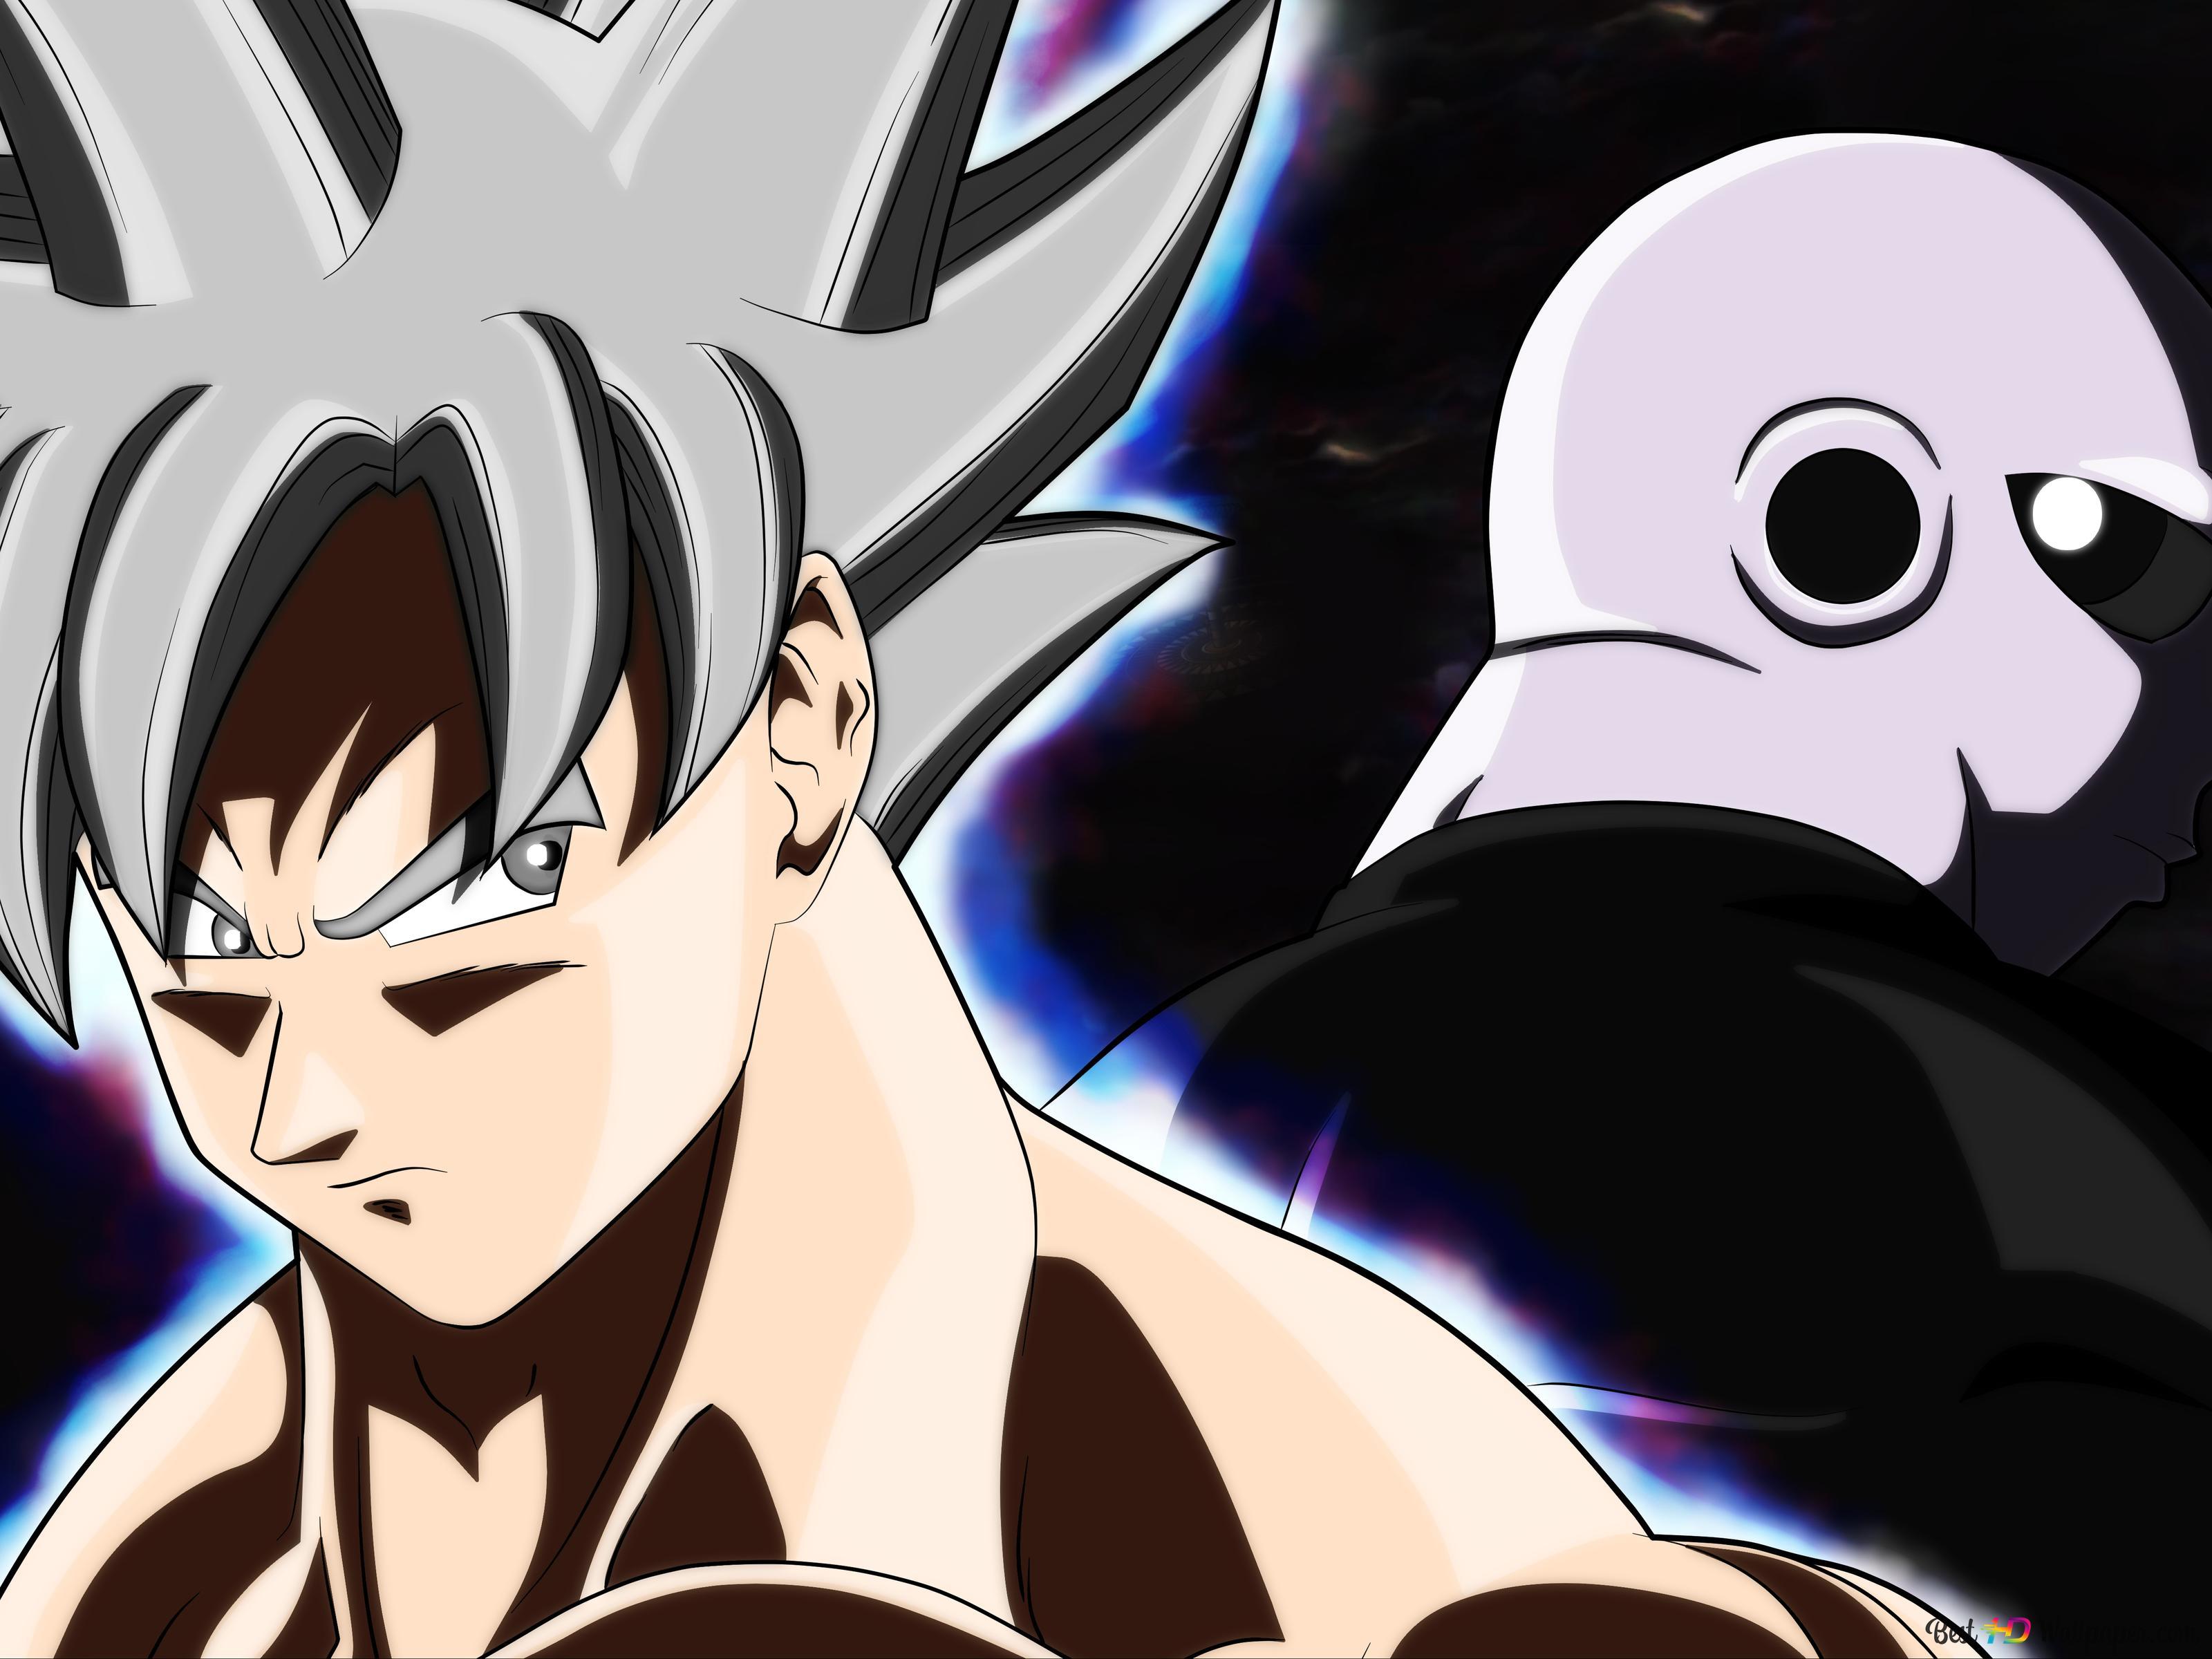 Descargar Fondo De Pantalla Goku Vs Jiren Hd